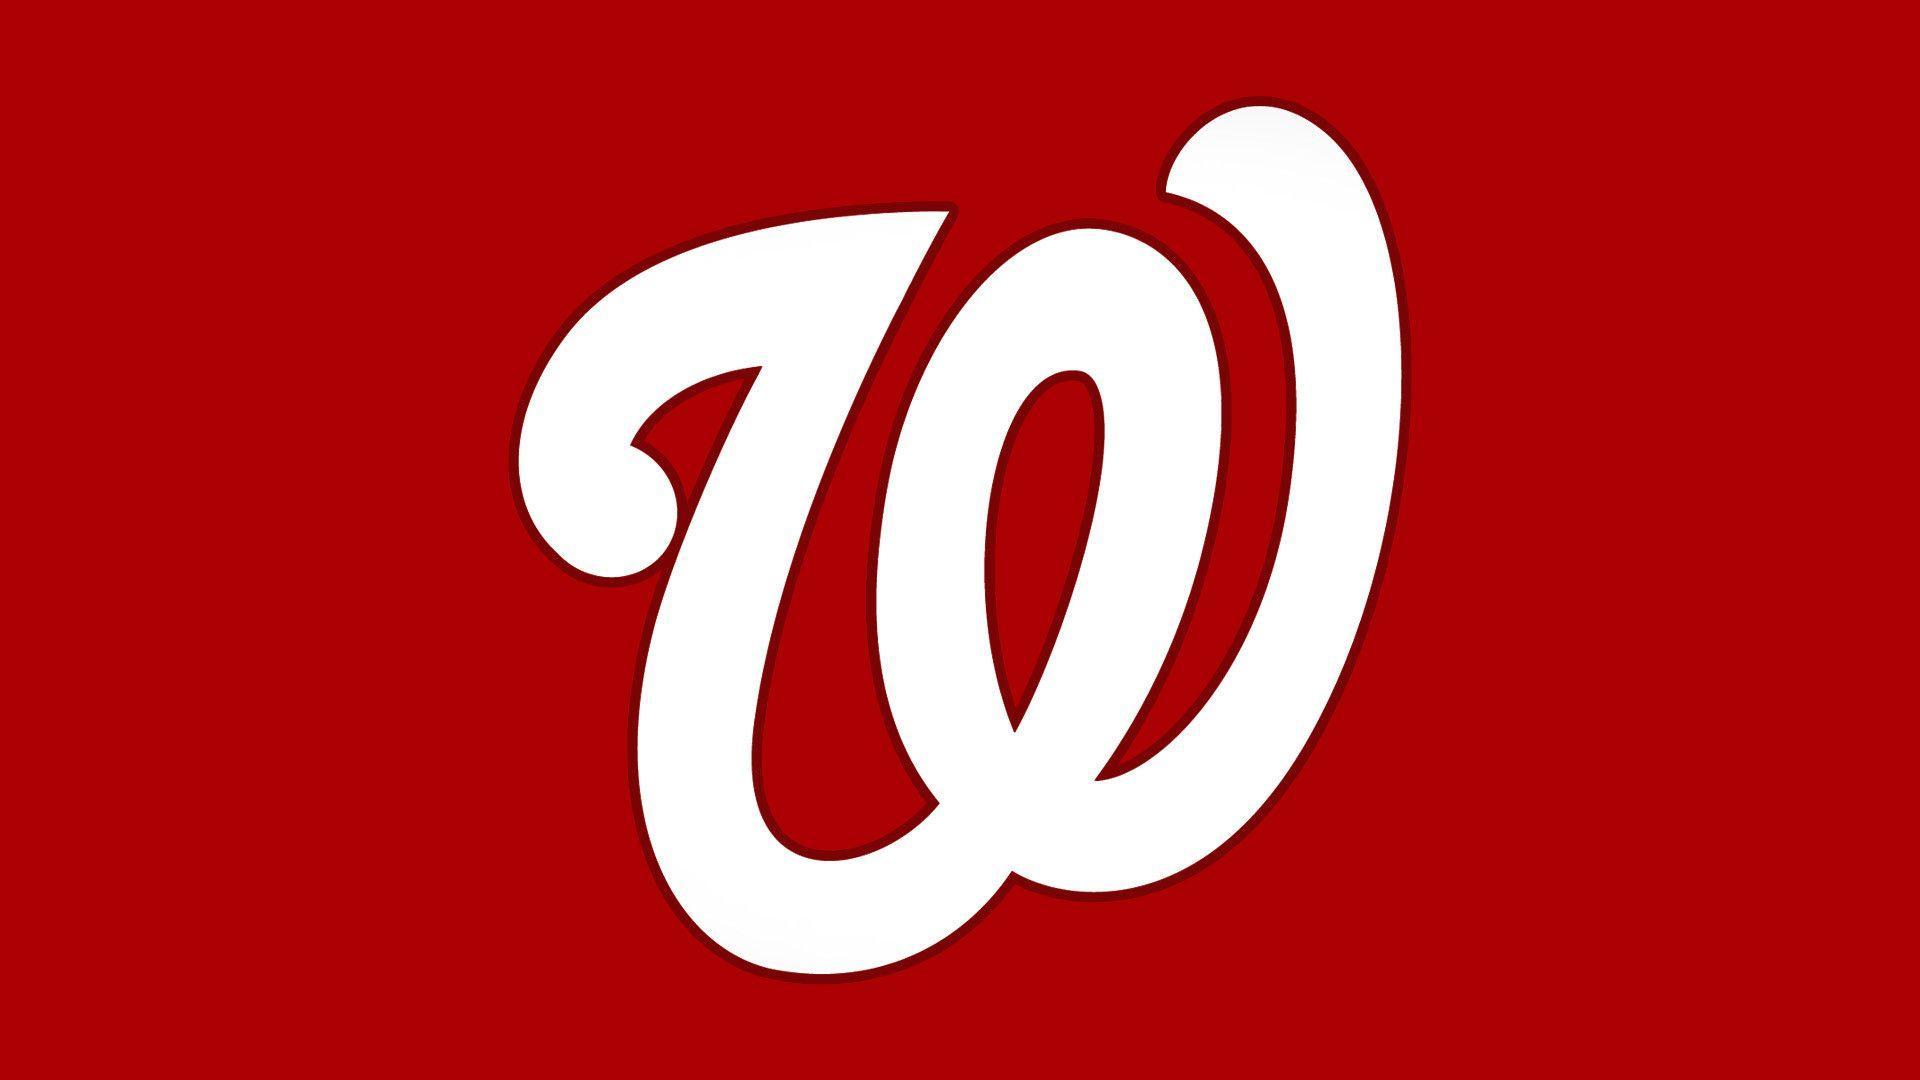 Washington Nationals Wallpapers Top Free Washington Nationals Backgrounds Wallpaperaccess